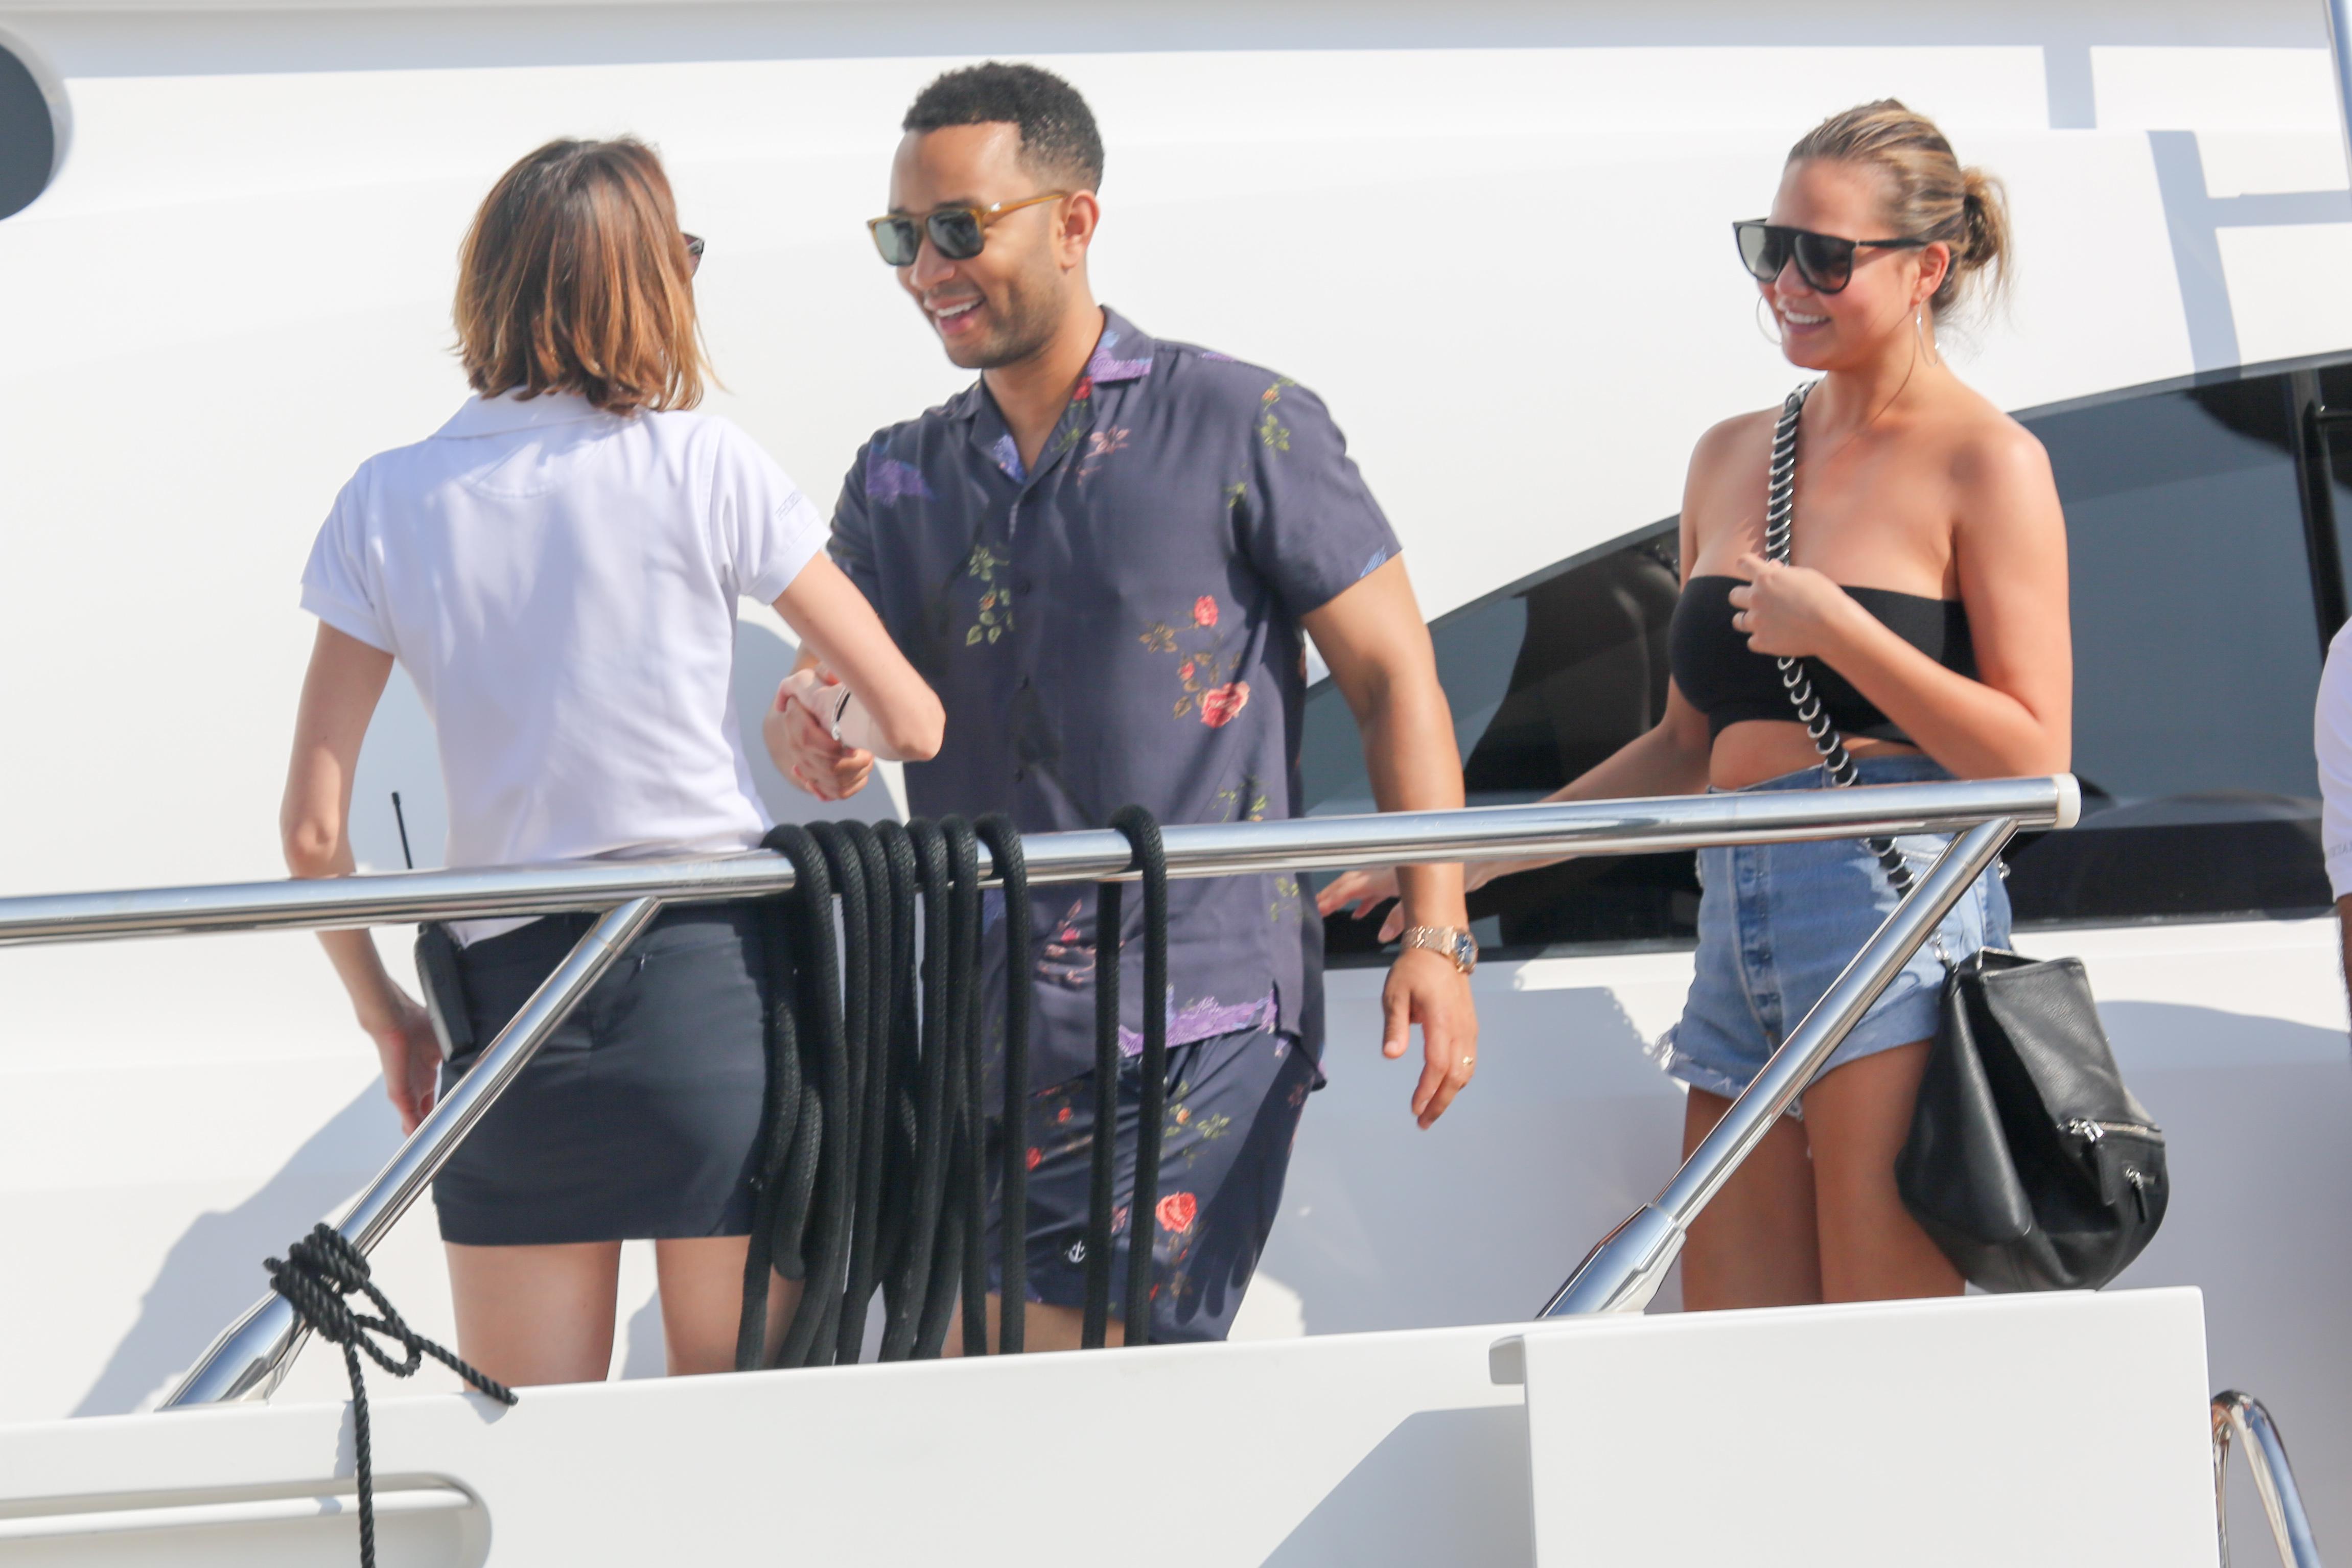 August 26, 2017 - Saint Tropez, FRANCE - John Legend and Chrissy Teigen on a yacht in Saint Tropez. <P> Pictured: John Legend and Chrissy Teigen <B>Ref: SPL1562509  260817  </B><BR/> Picture by: Splash News<BR/> </P><P> <B>Splash News and Pictures</B><BR/> Los Angeles:310-821-2666<BR/> New York:212-619-2666<BR/> London:870-934-2666<BR/> <span id=